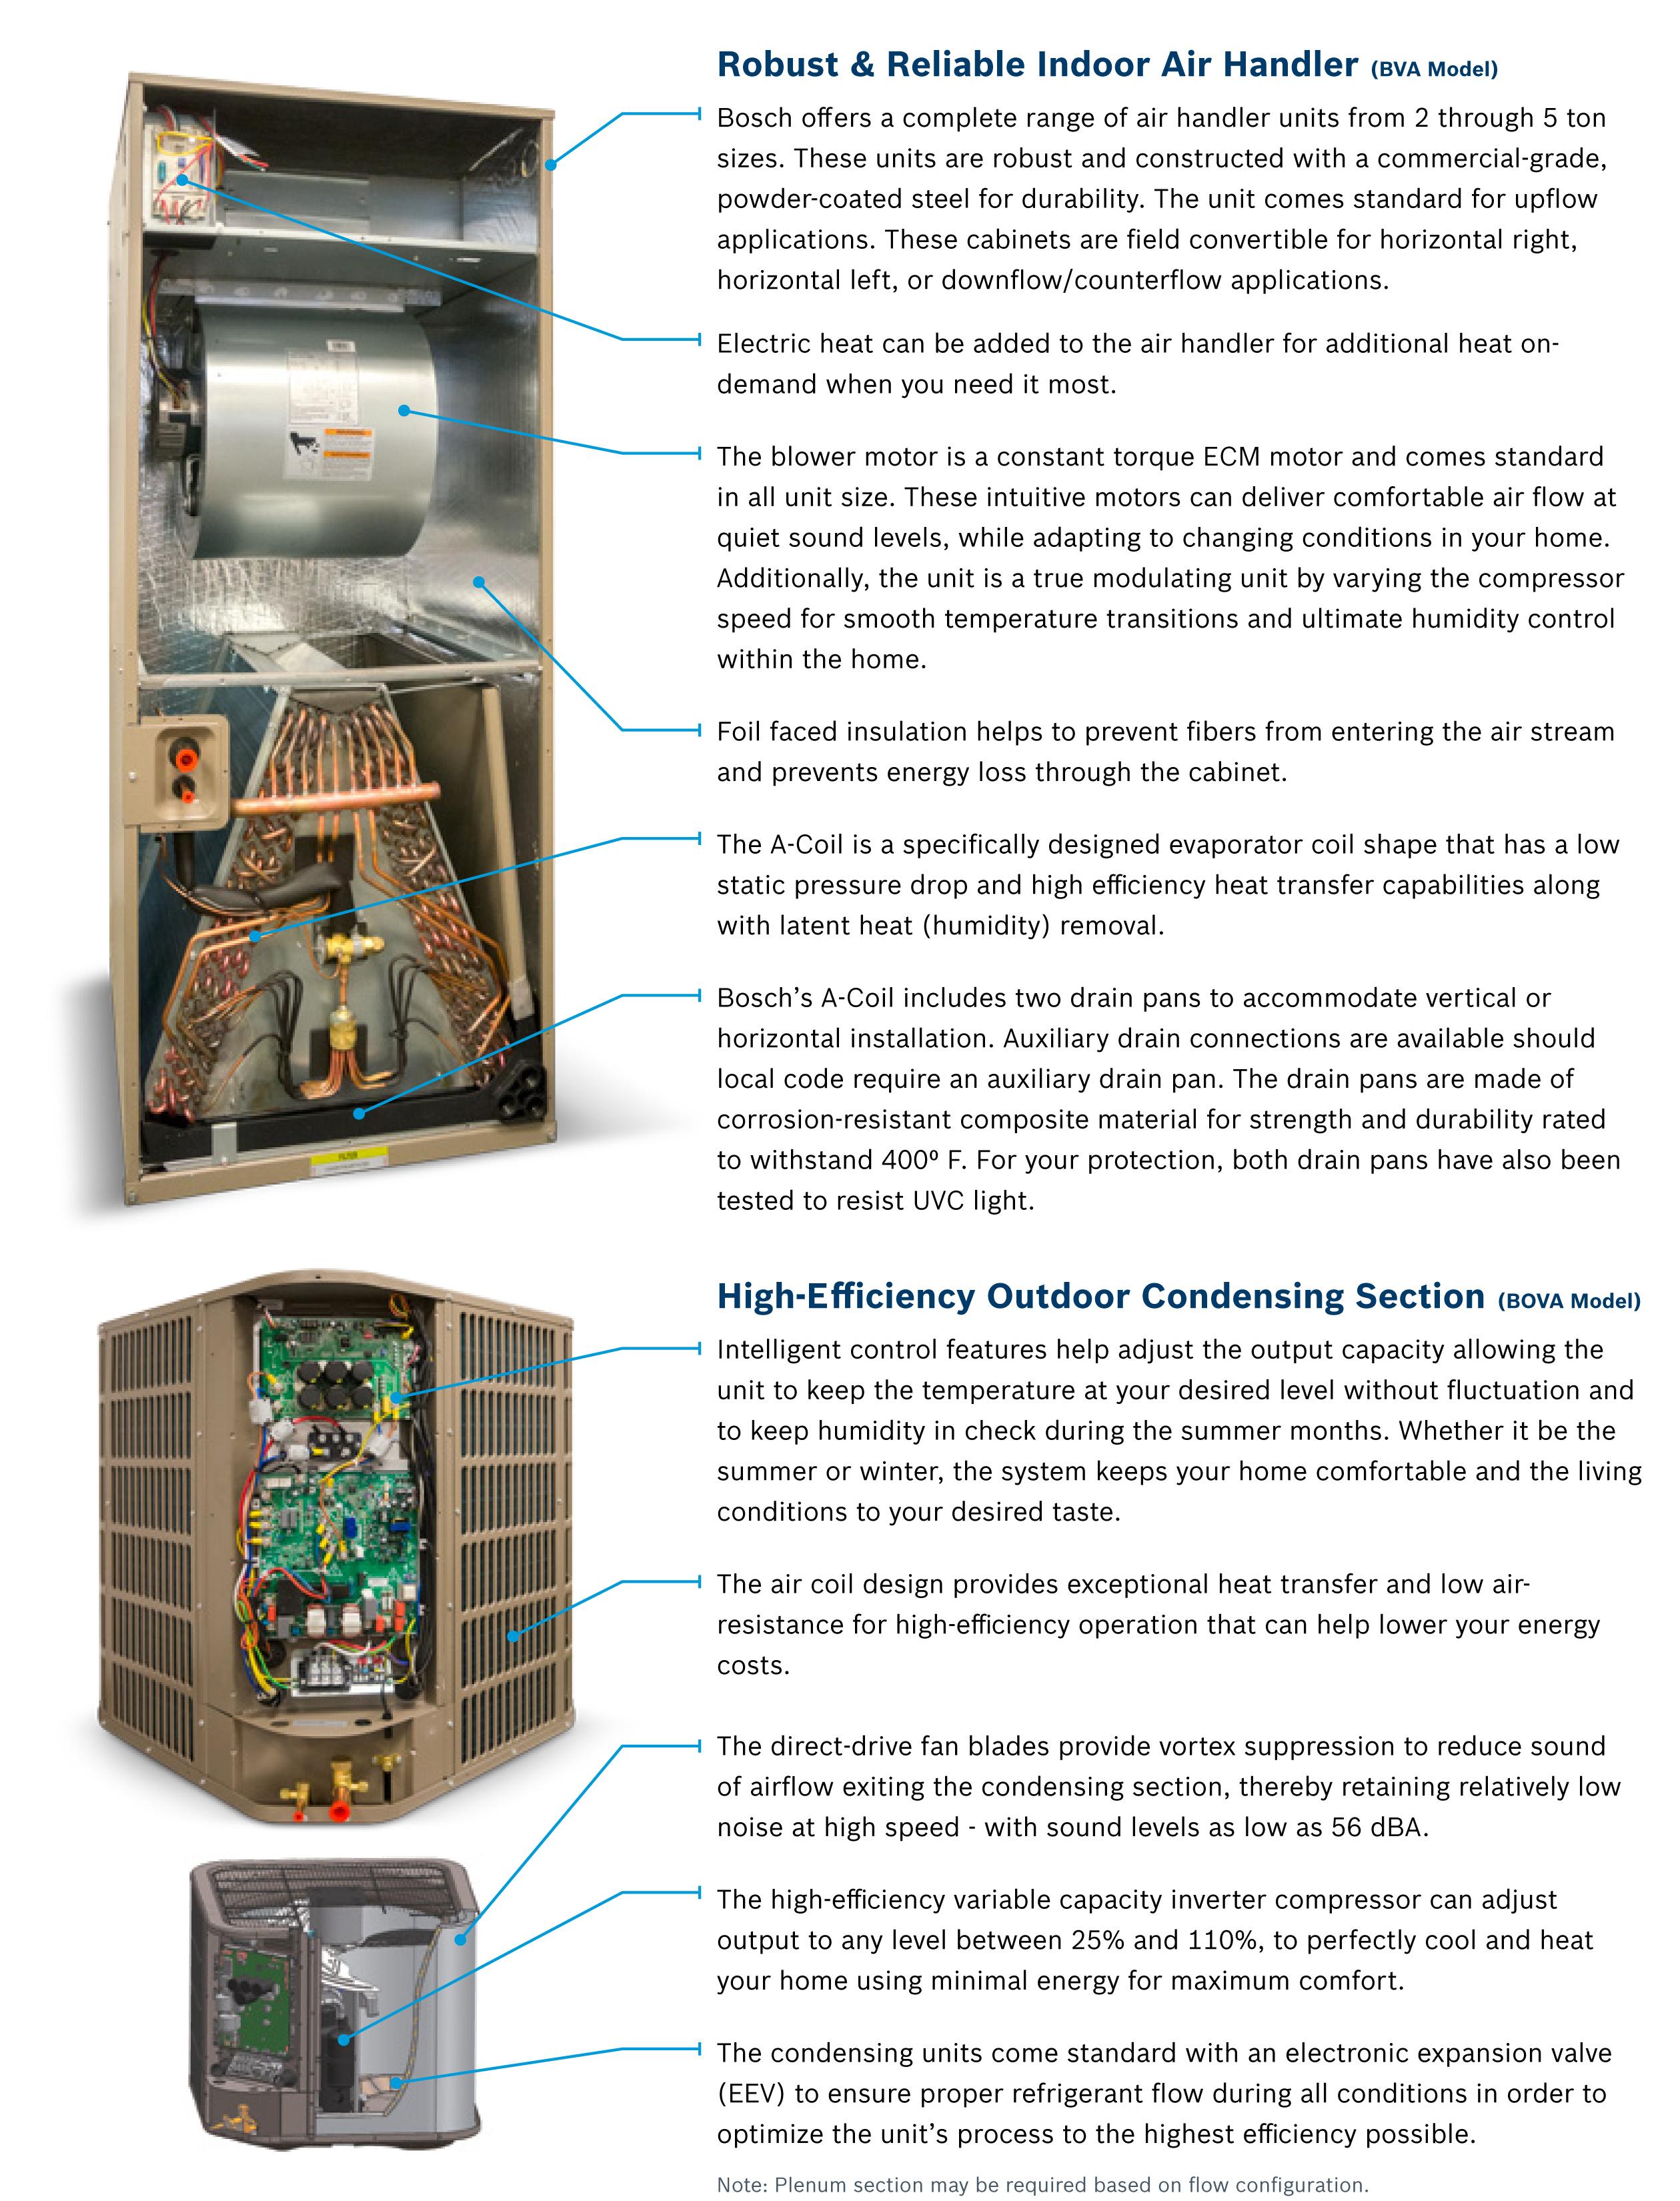 4 Ton Bosch 18.5 SEER Heat Pump Inverter System BOVA-60HDN1-M18M,  Bosch Air Compressor Wiring Diagram on